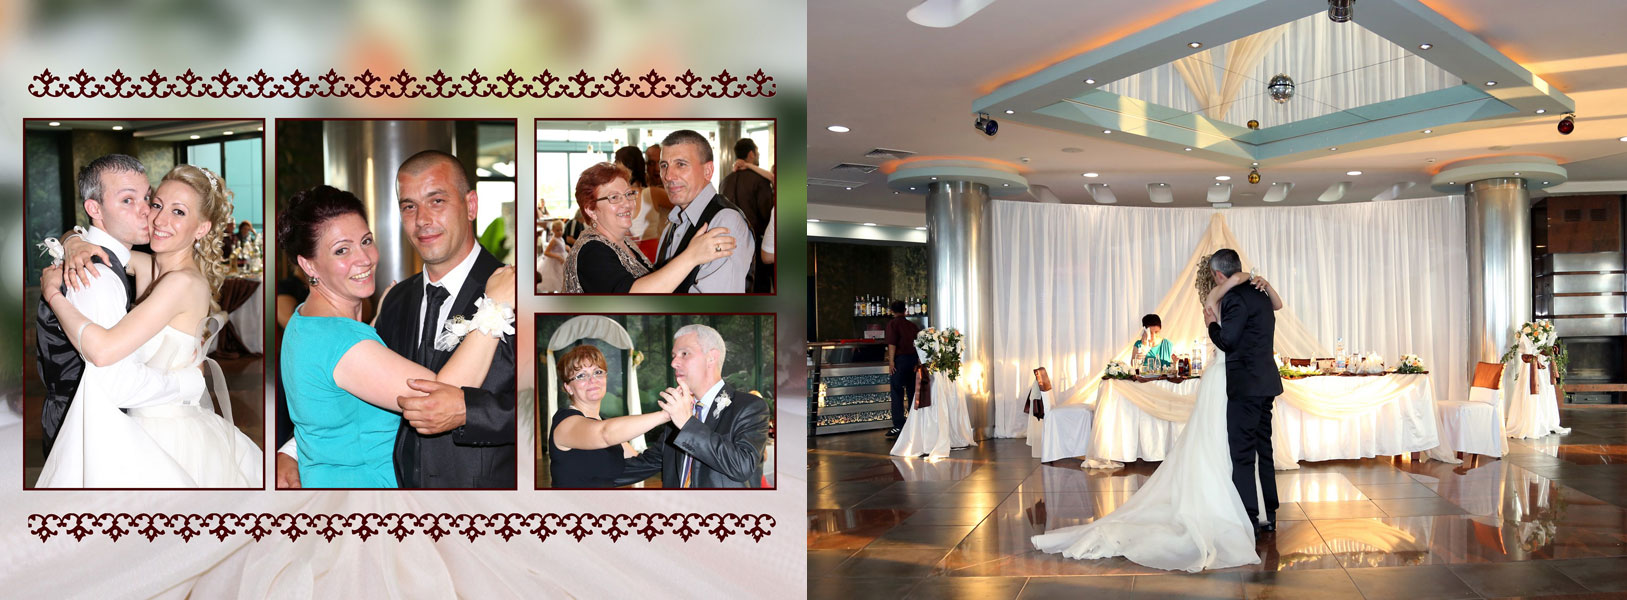 Drag Studio | Детска и сватбена фотография. | 26-27.jpg